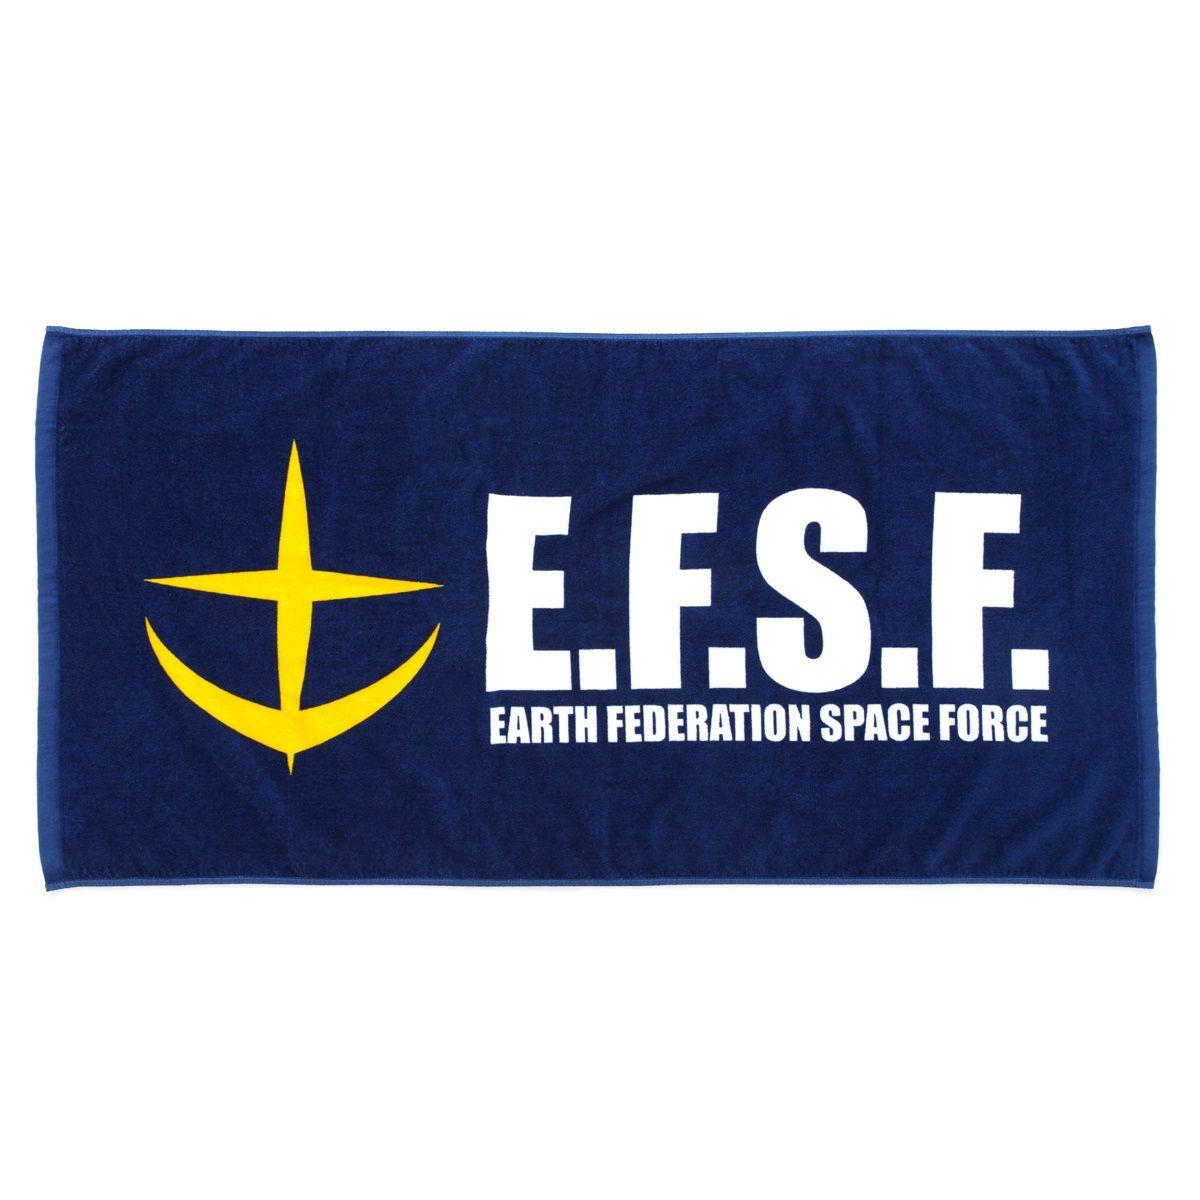 Mobile Suit Gundam Earth Federation Space Force Bath Towel